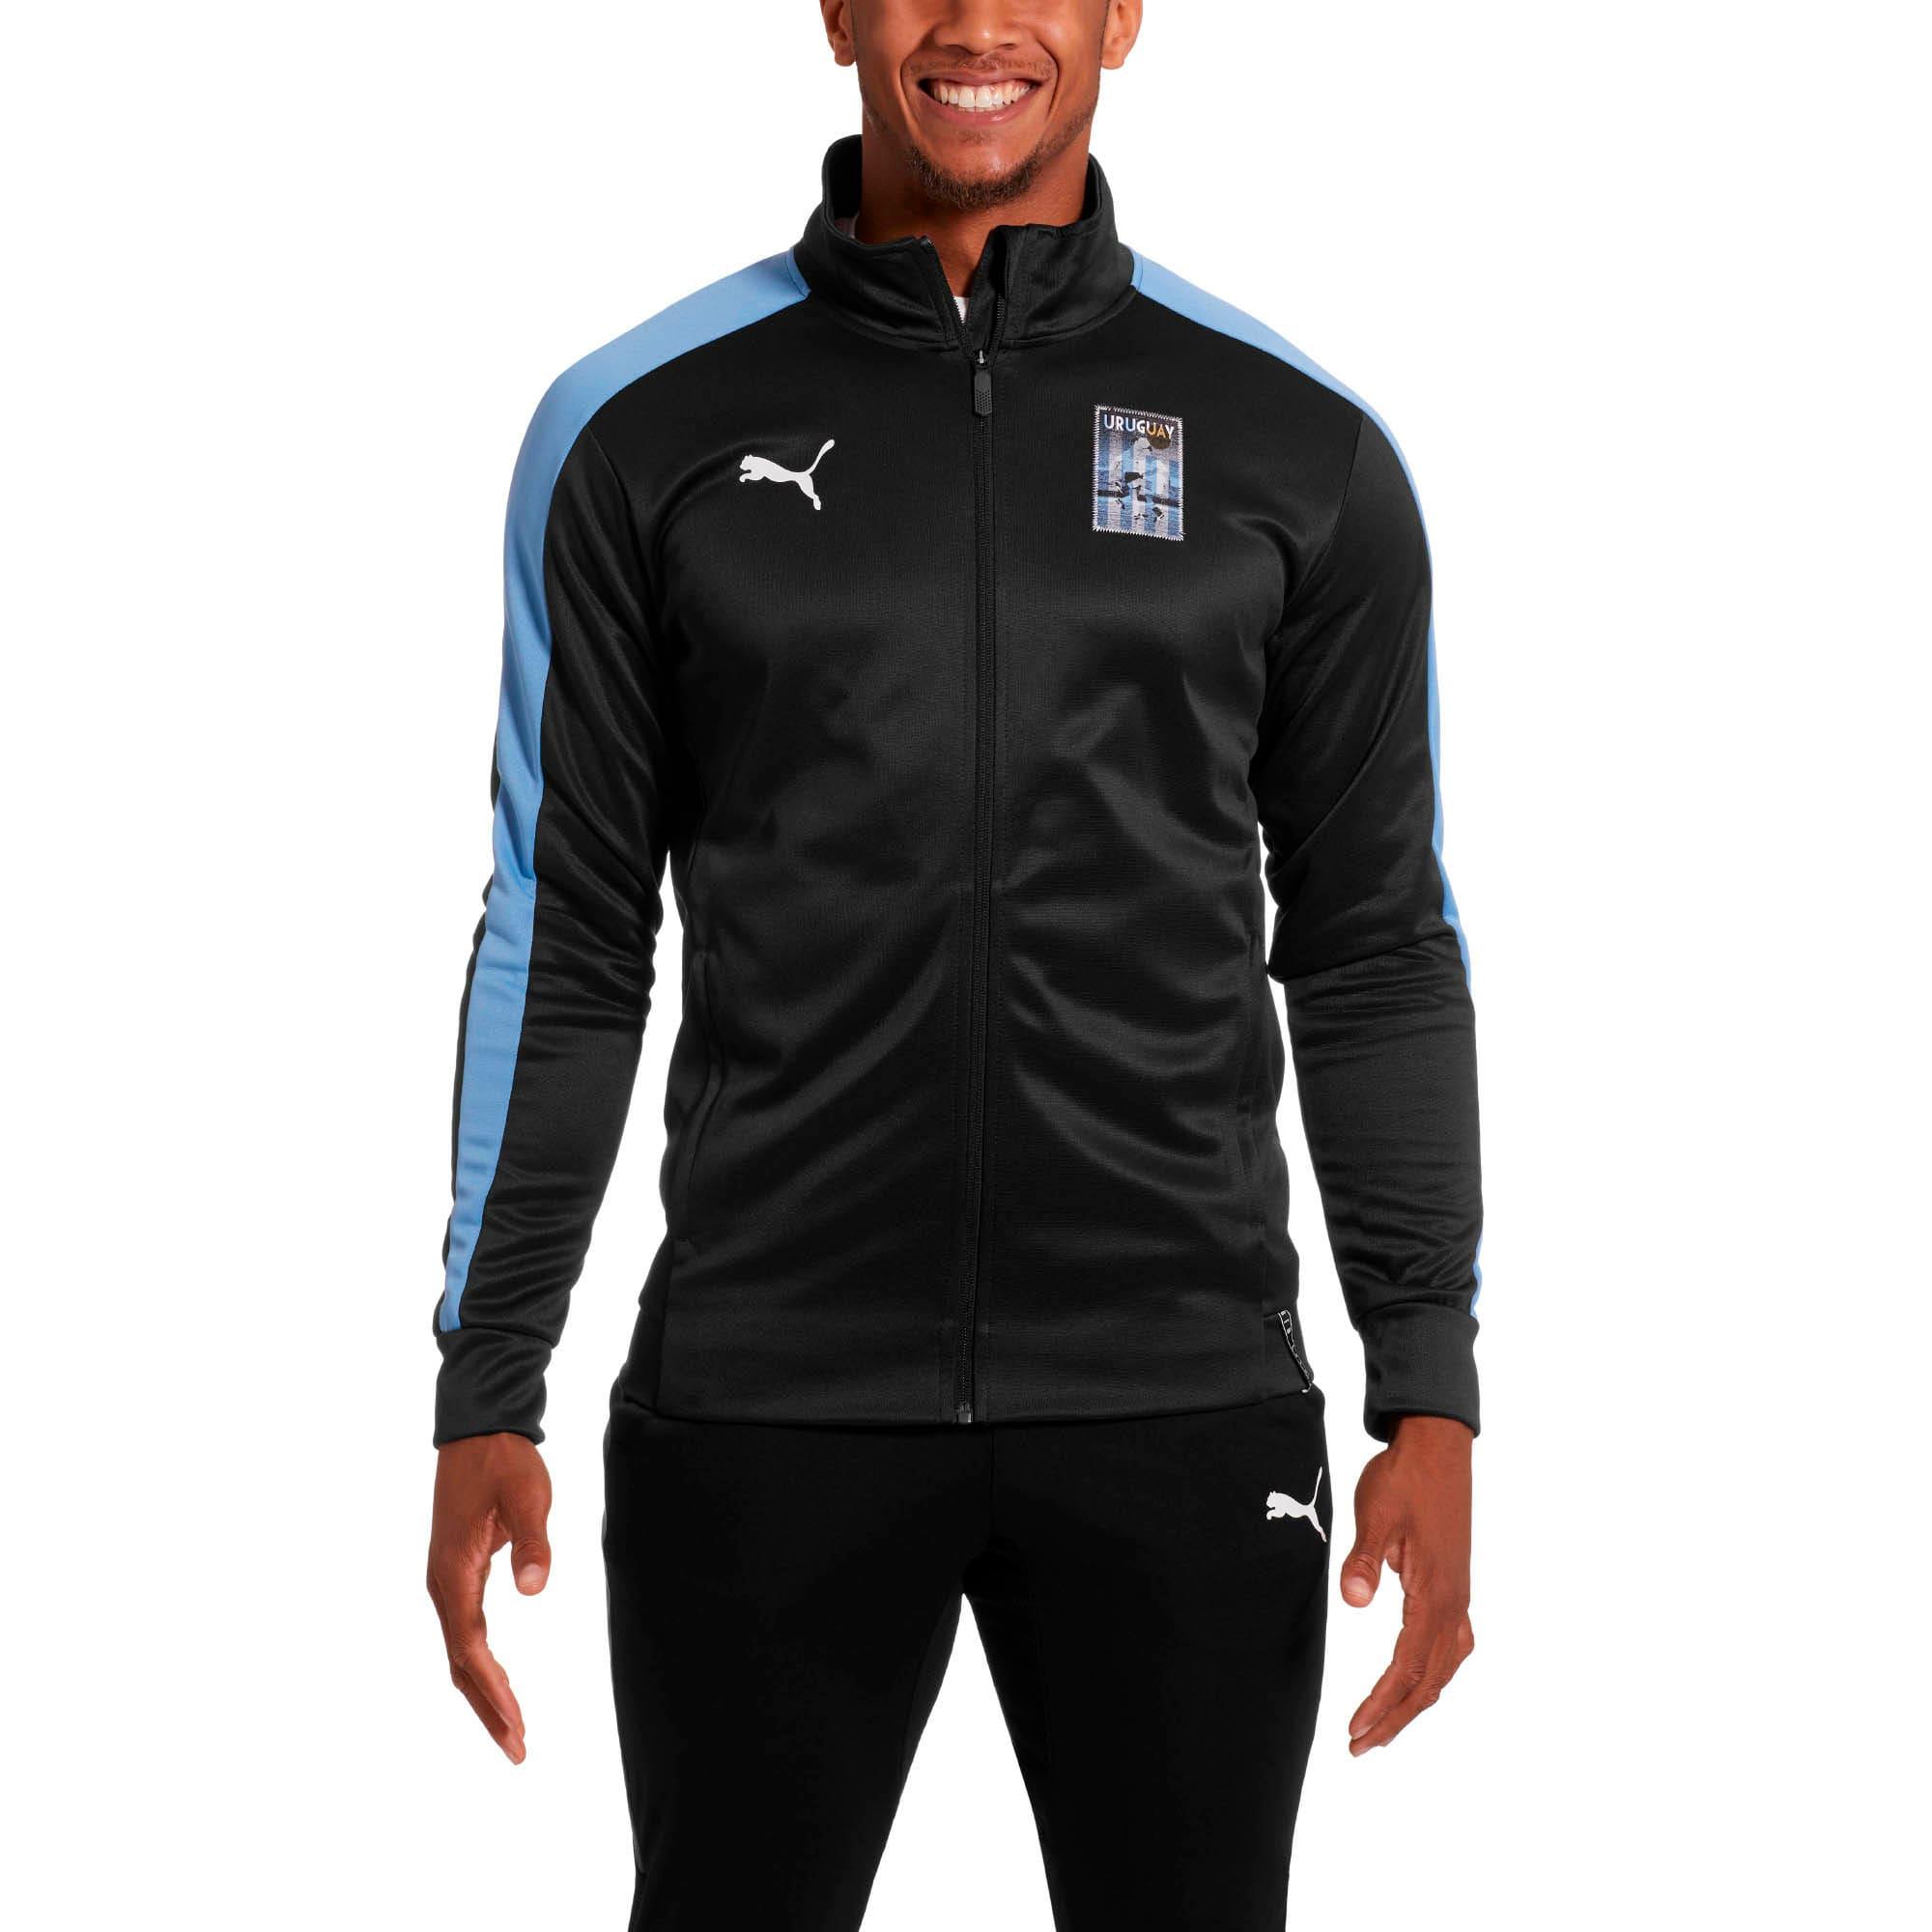 Thumbnail 1 of Copa America Men's T7 Track Jacket, Puma Black-Silver Lake Blue, medium